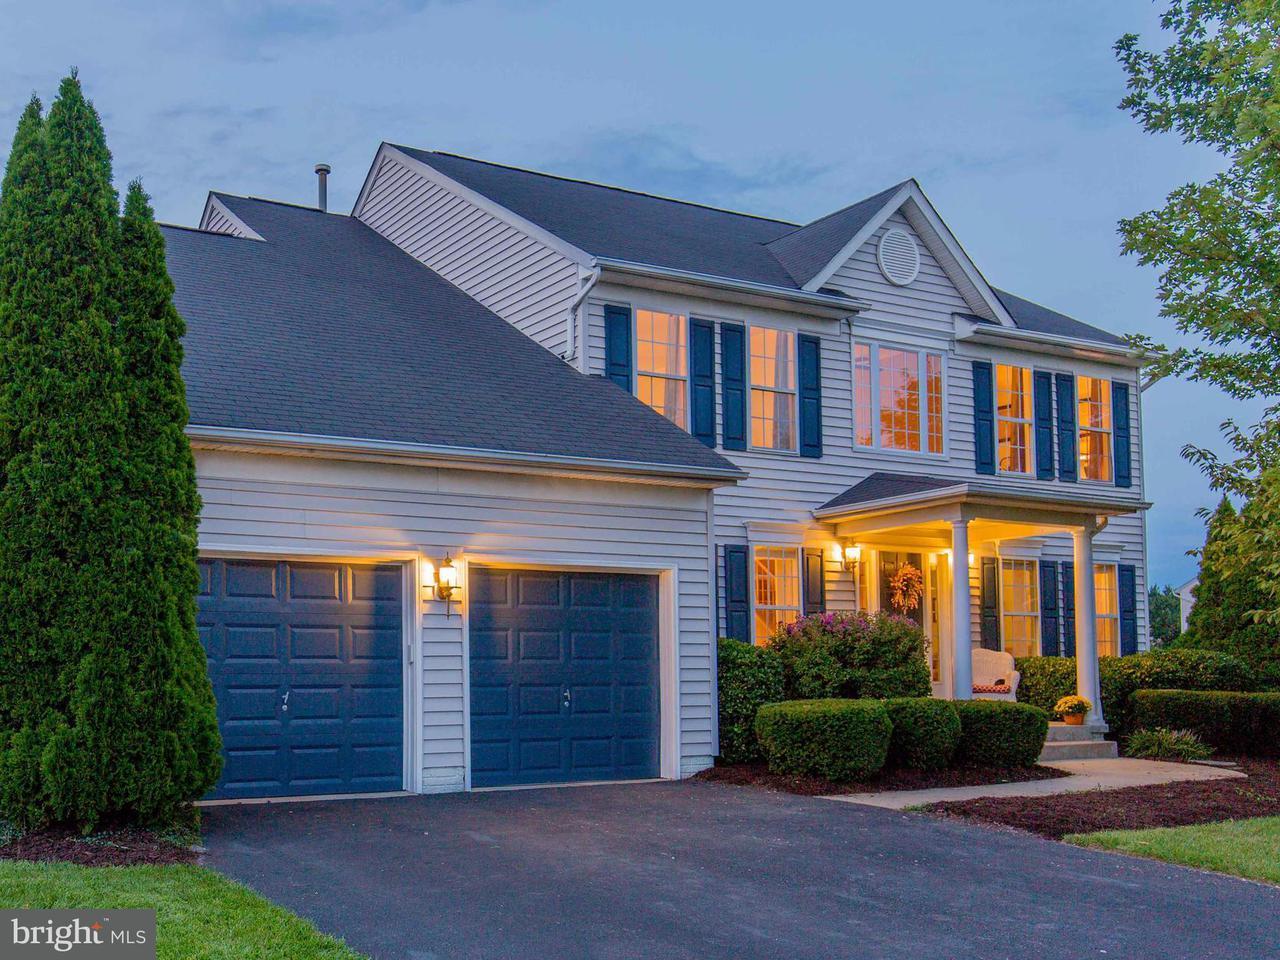 Villa per Vendita alle ore 5930 NORWOOD PL W 5930 NORWOOD PL W Adamstown, Maryland 21710 Stati Uniti